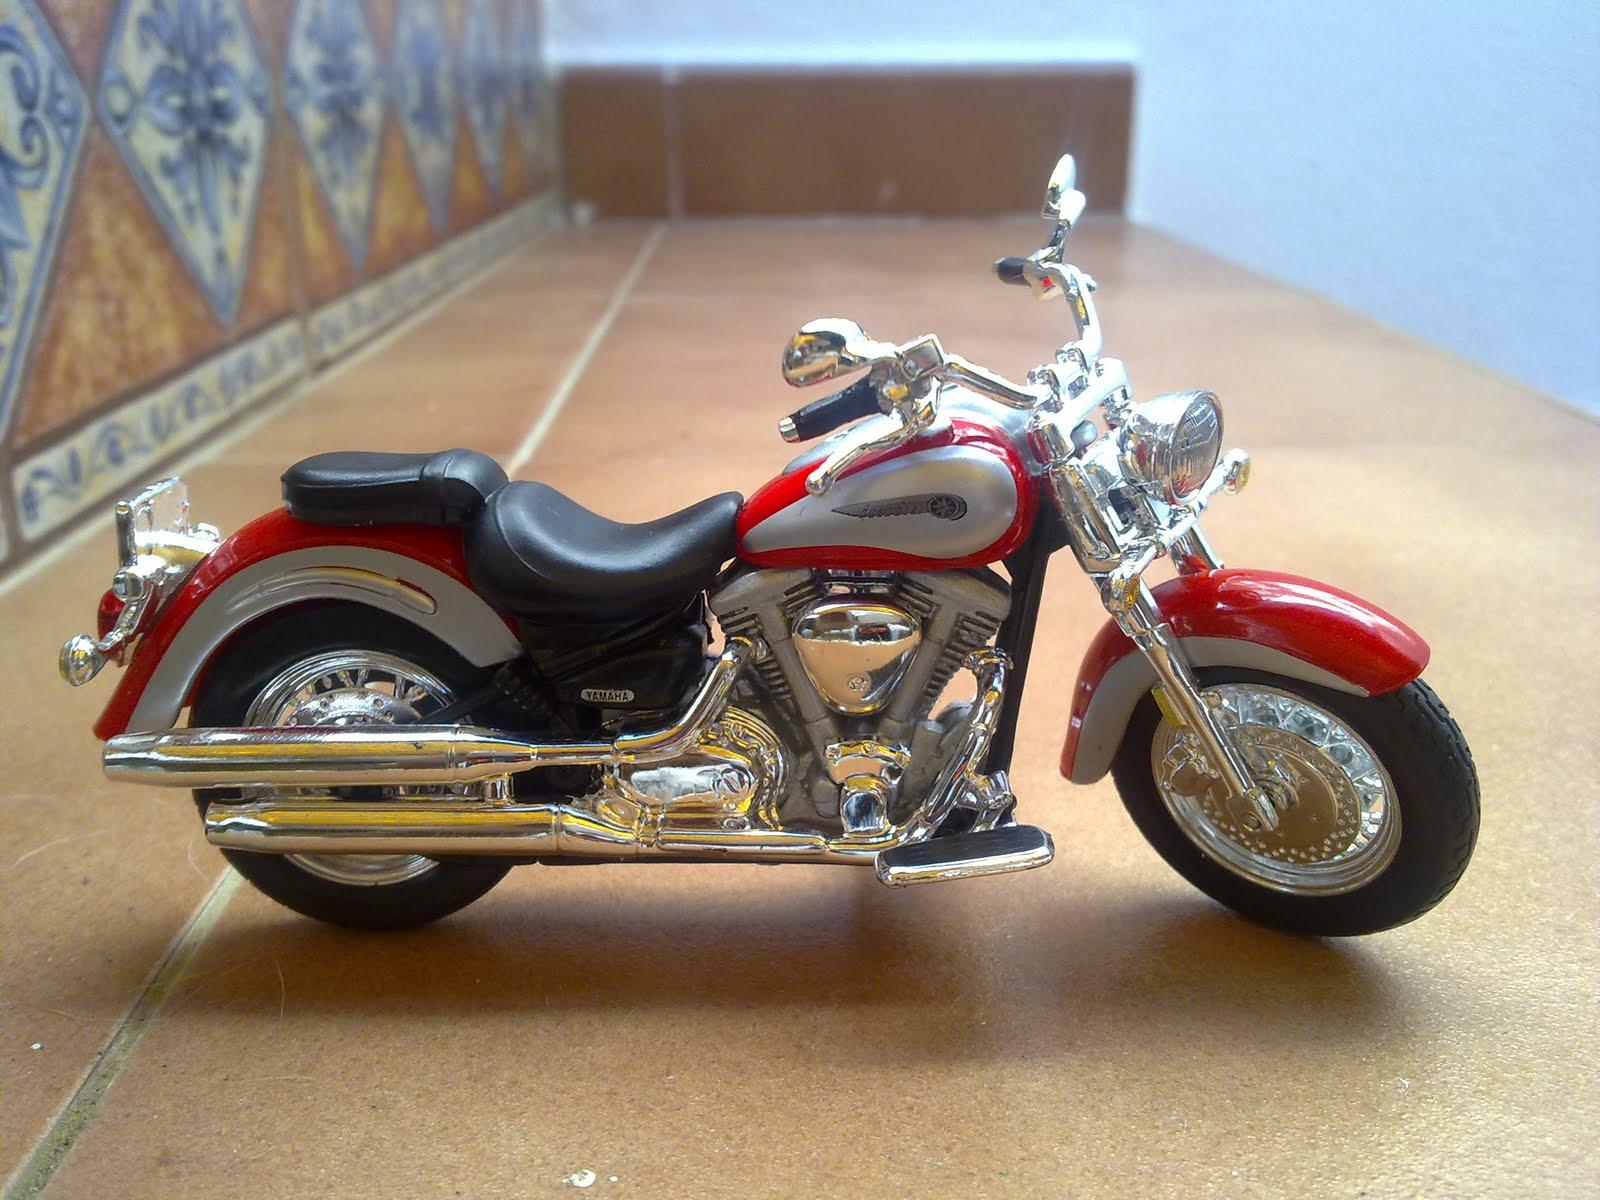 colecci n motos escala 1 18 yamaha drag star 1100 2007. Black Bedroom Furniture Sets. Home Design Ideas